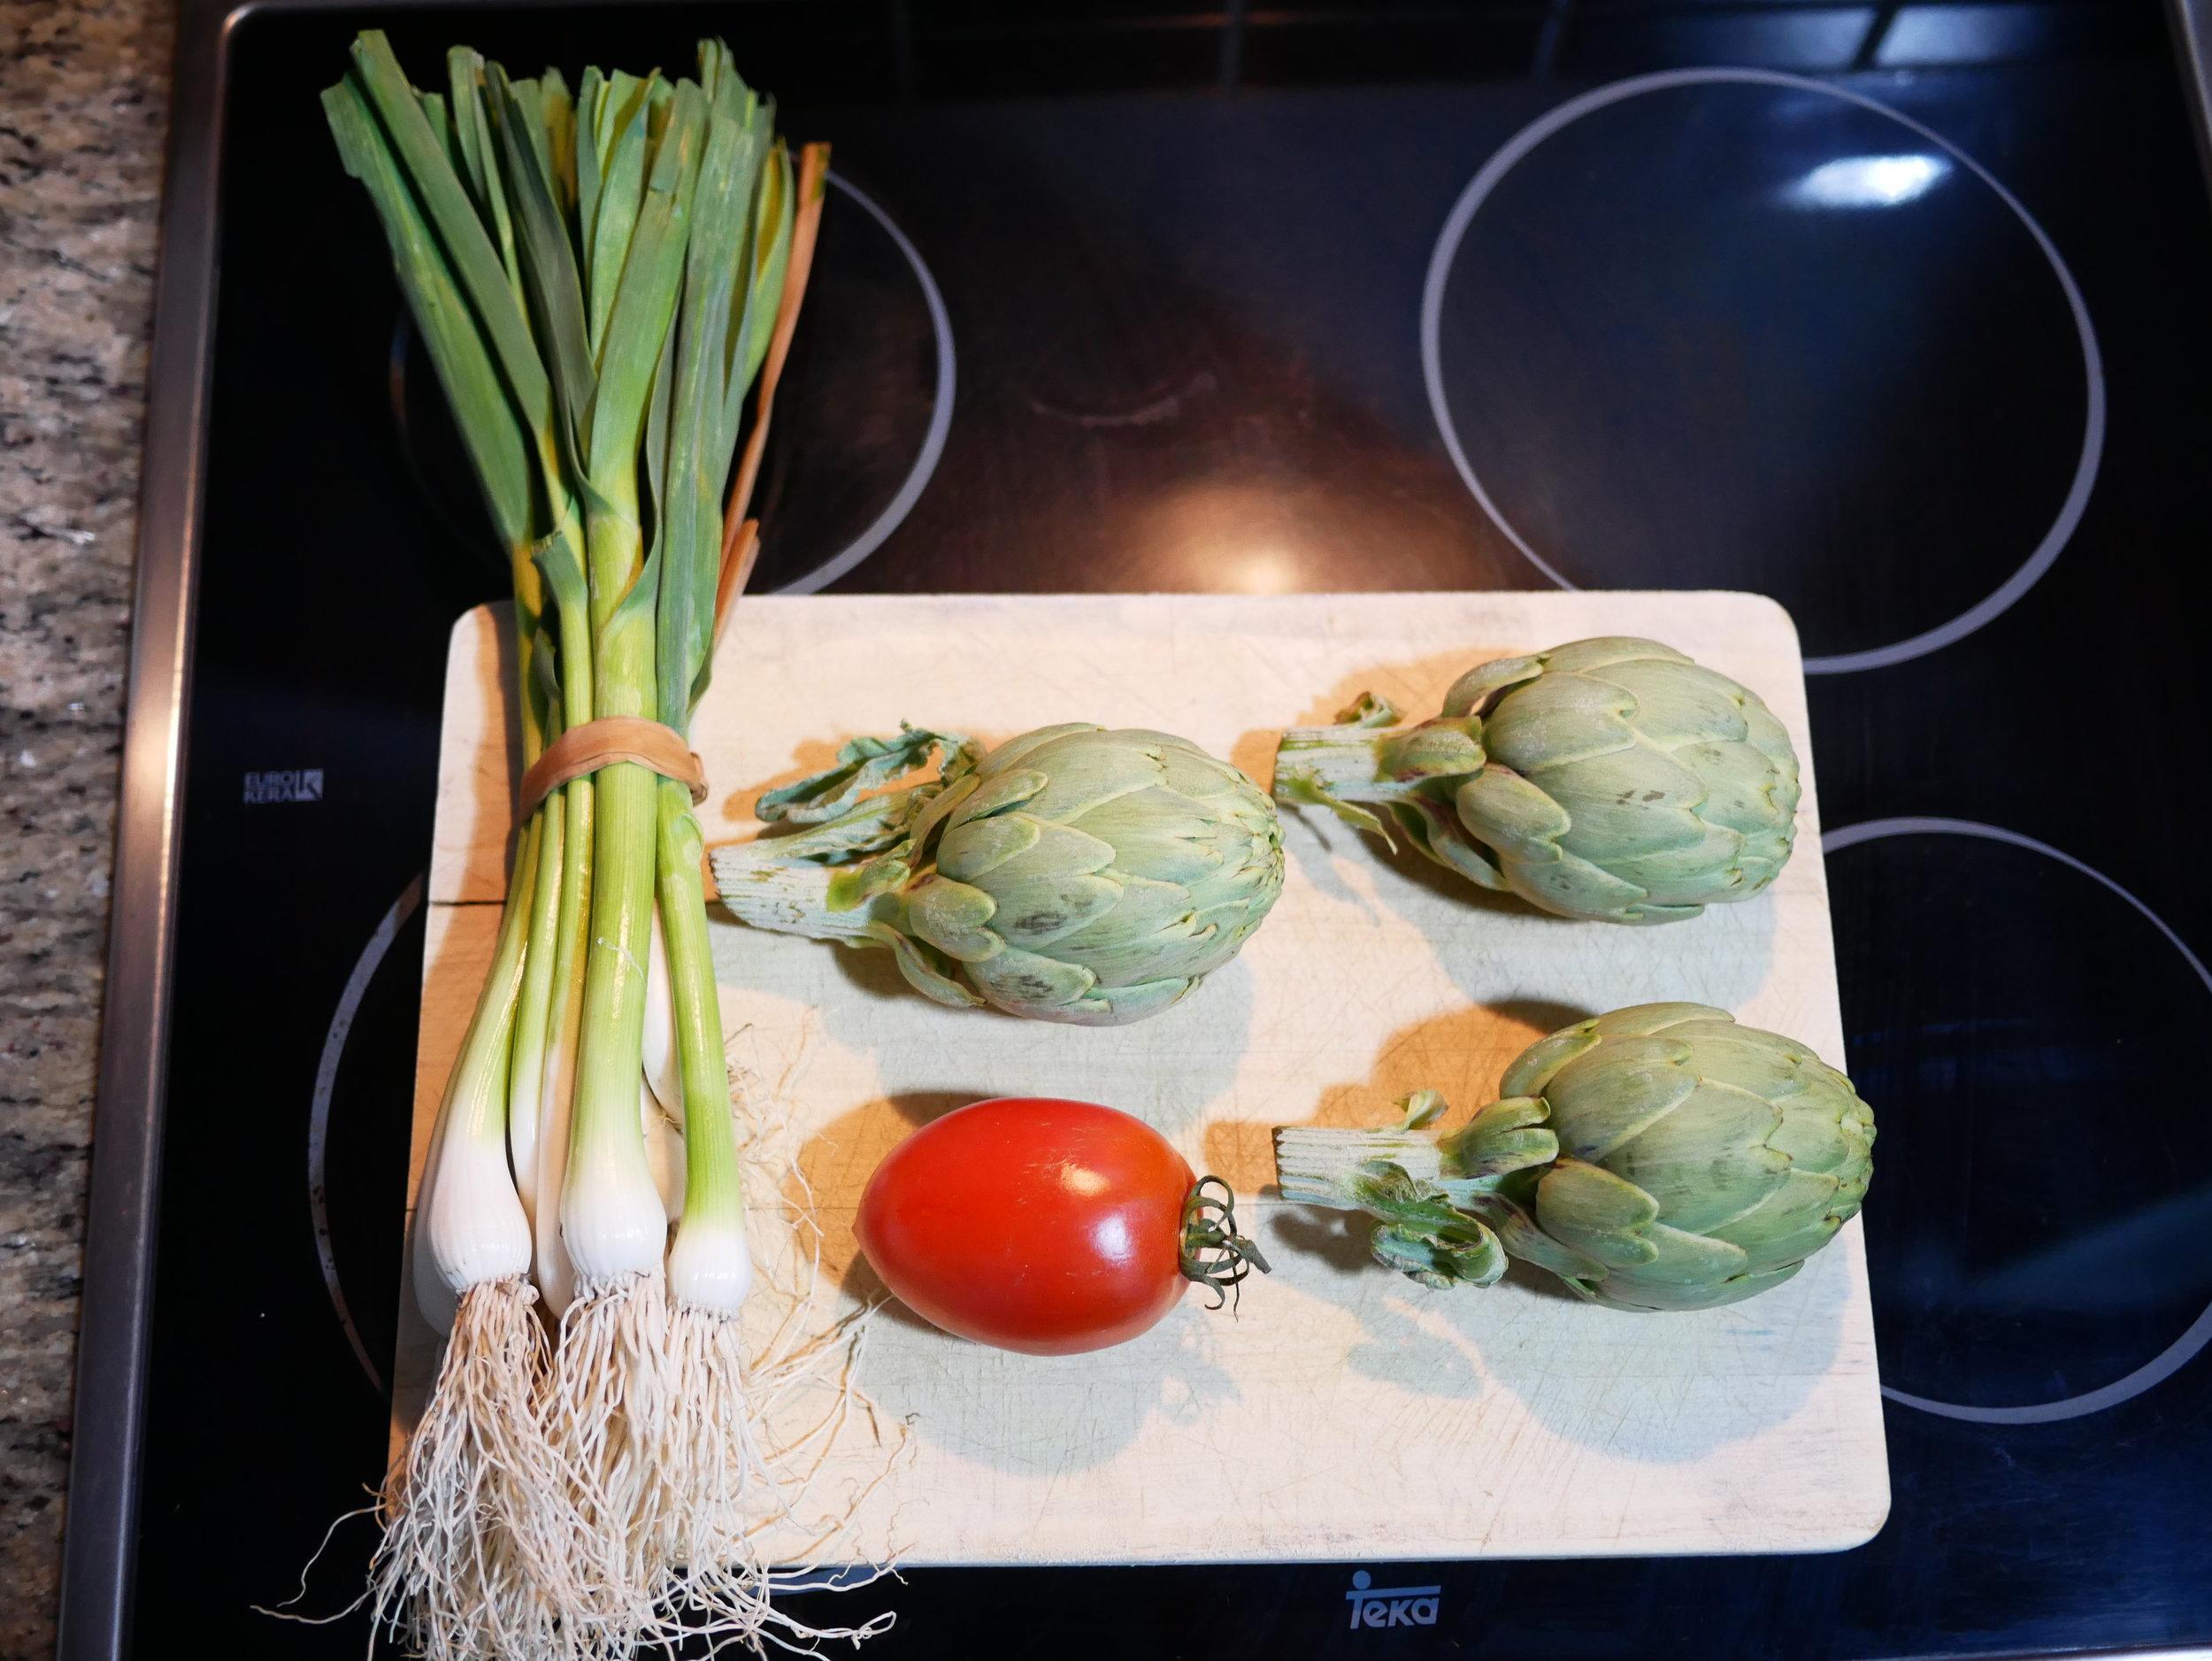 Spring paella ingredients